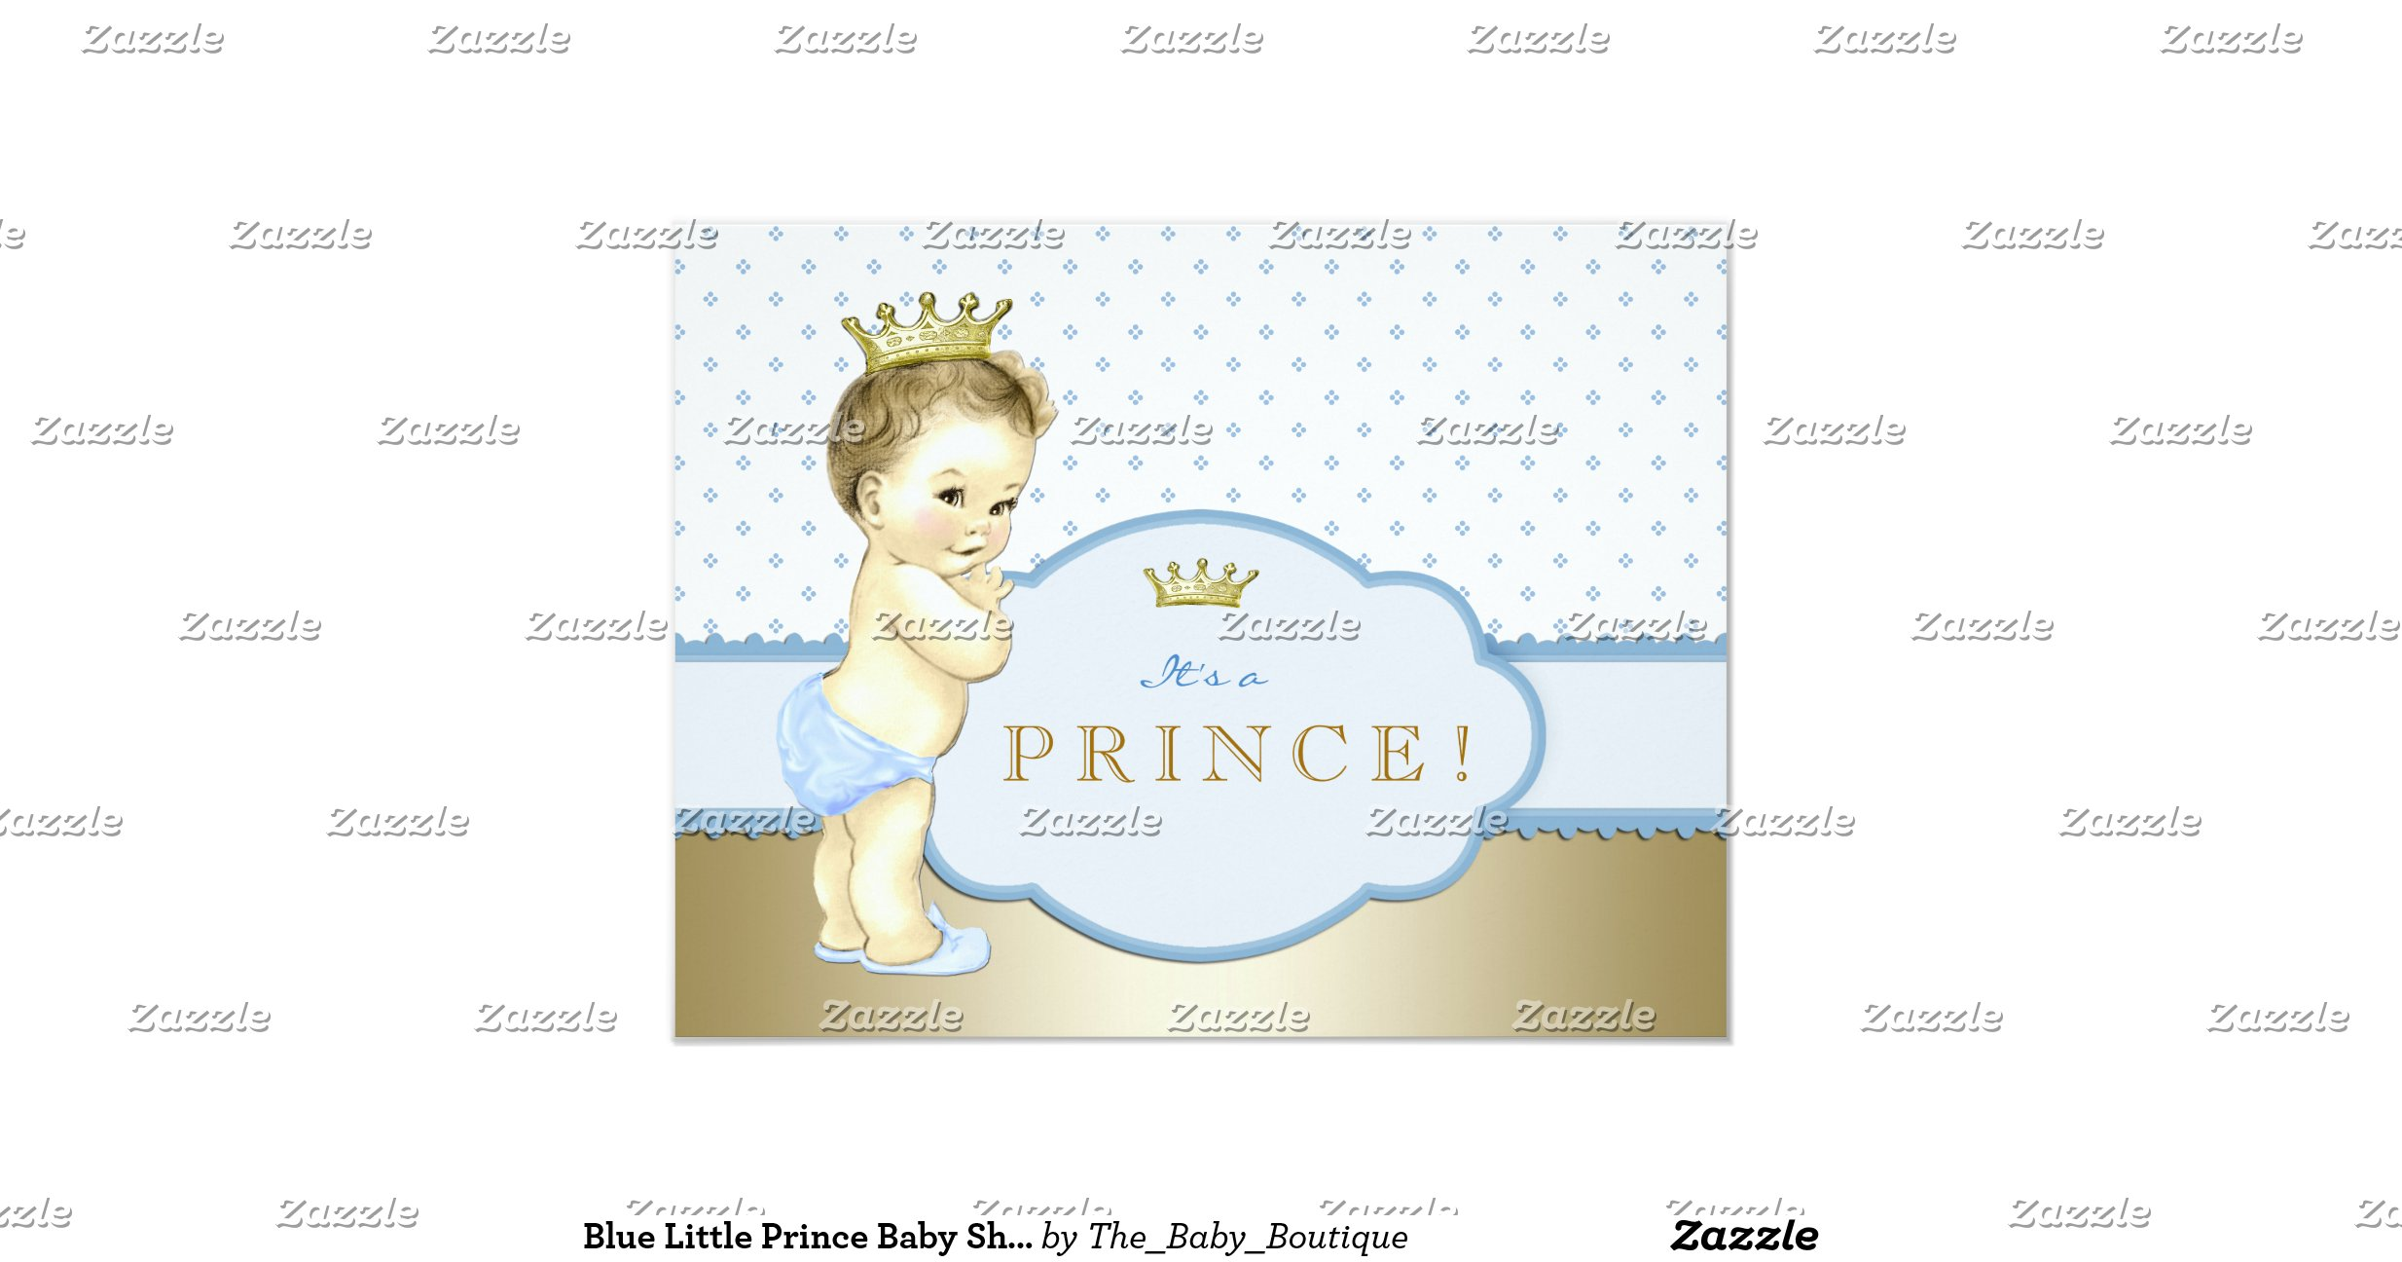 blue little prince baby shower paper invitation card zazzle